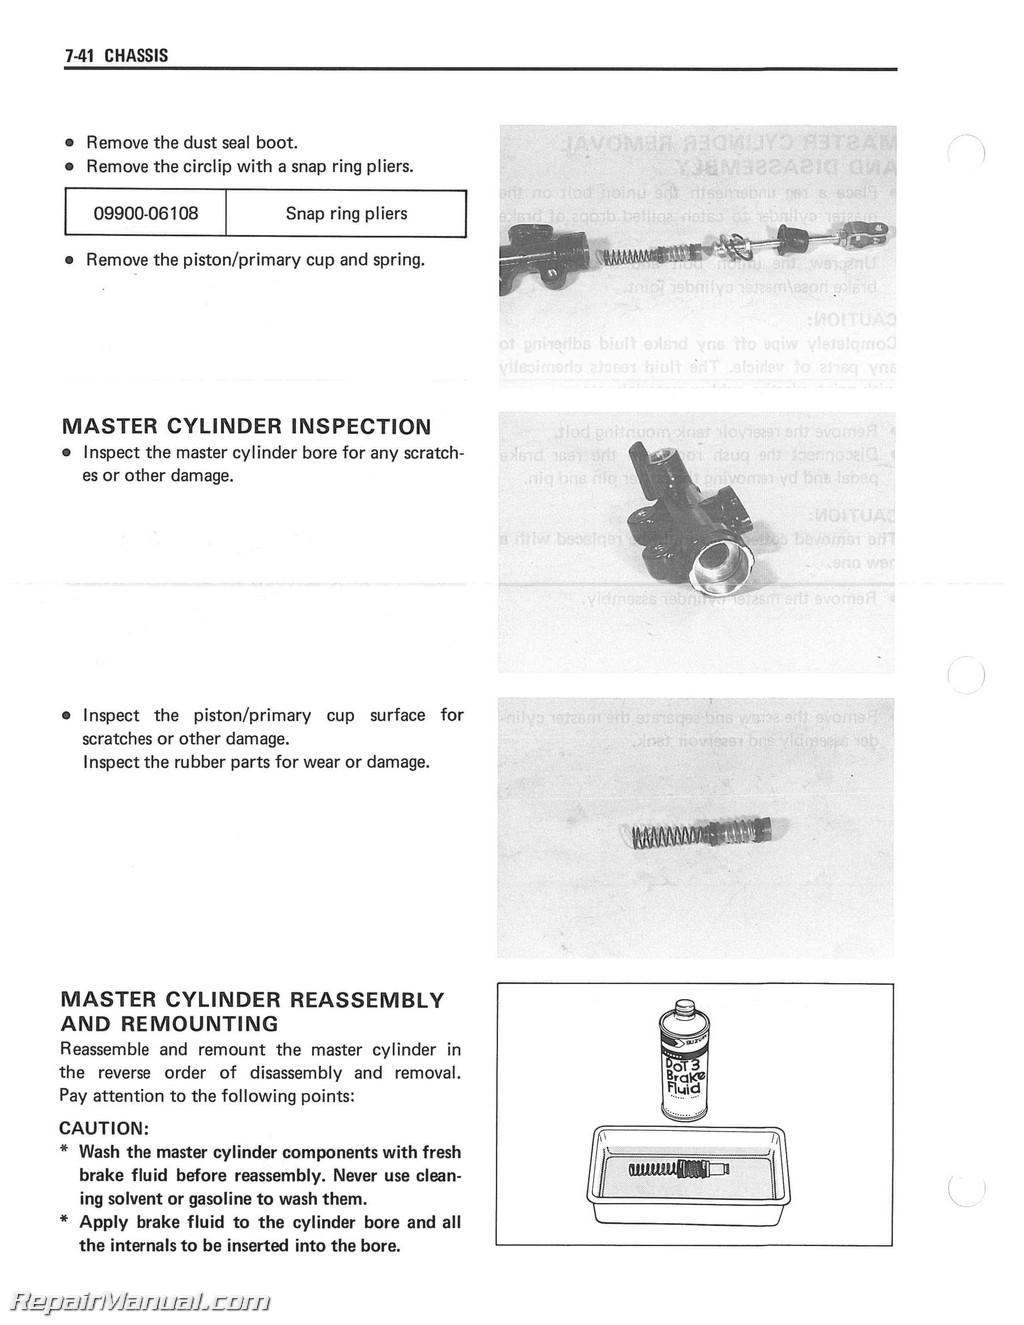 Lt 250r Wiring Diagram And Schematics Suzuki Lt250r 1987 1992 Quad Racer Atv Service Manual Residential Electrical Diagrams 89